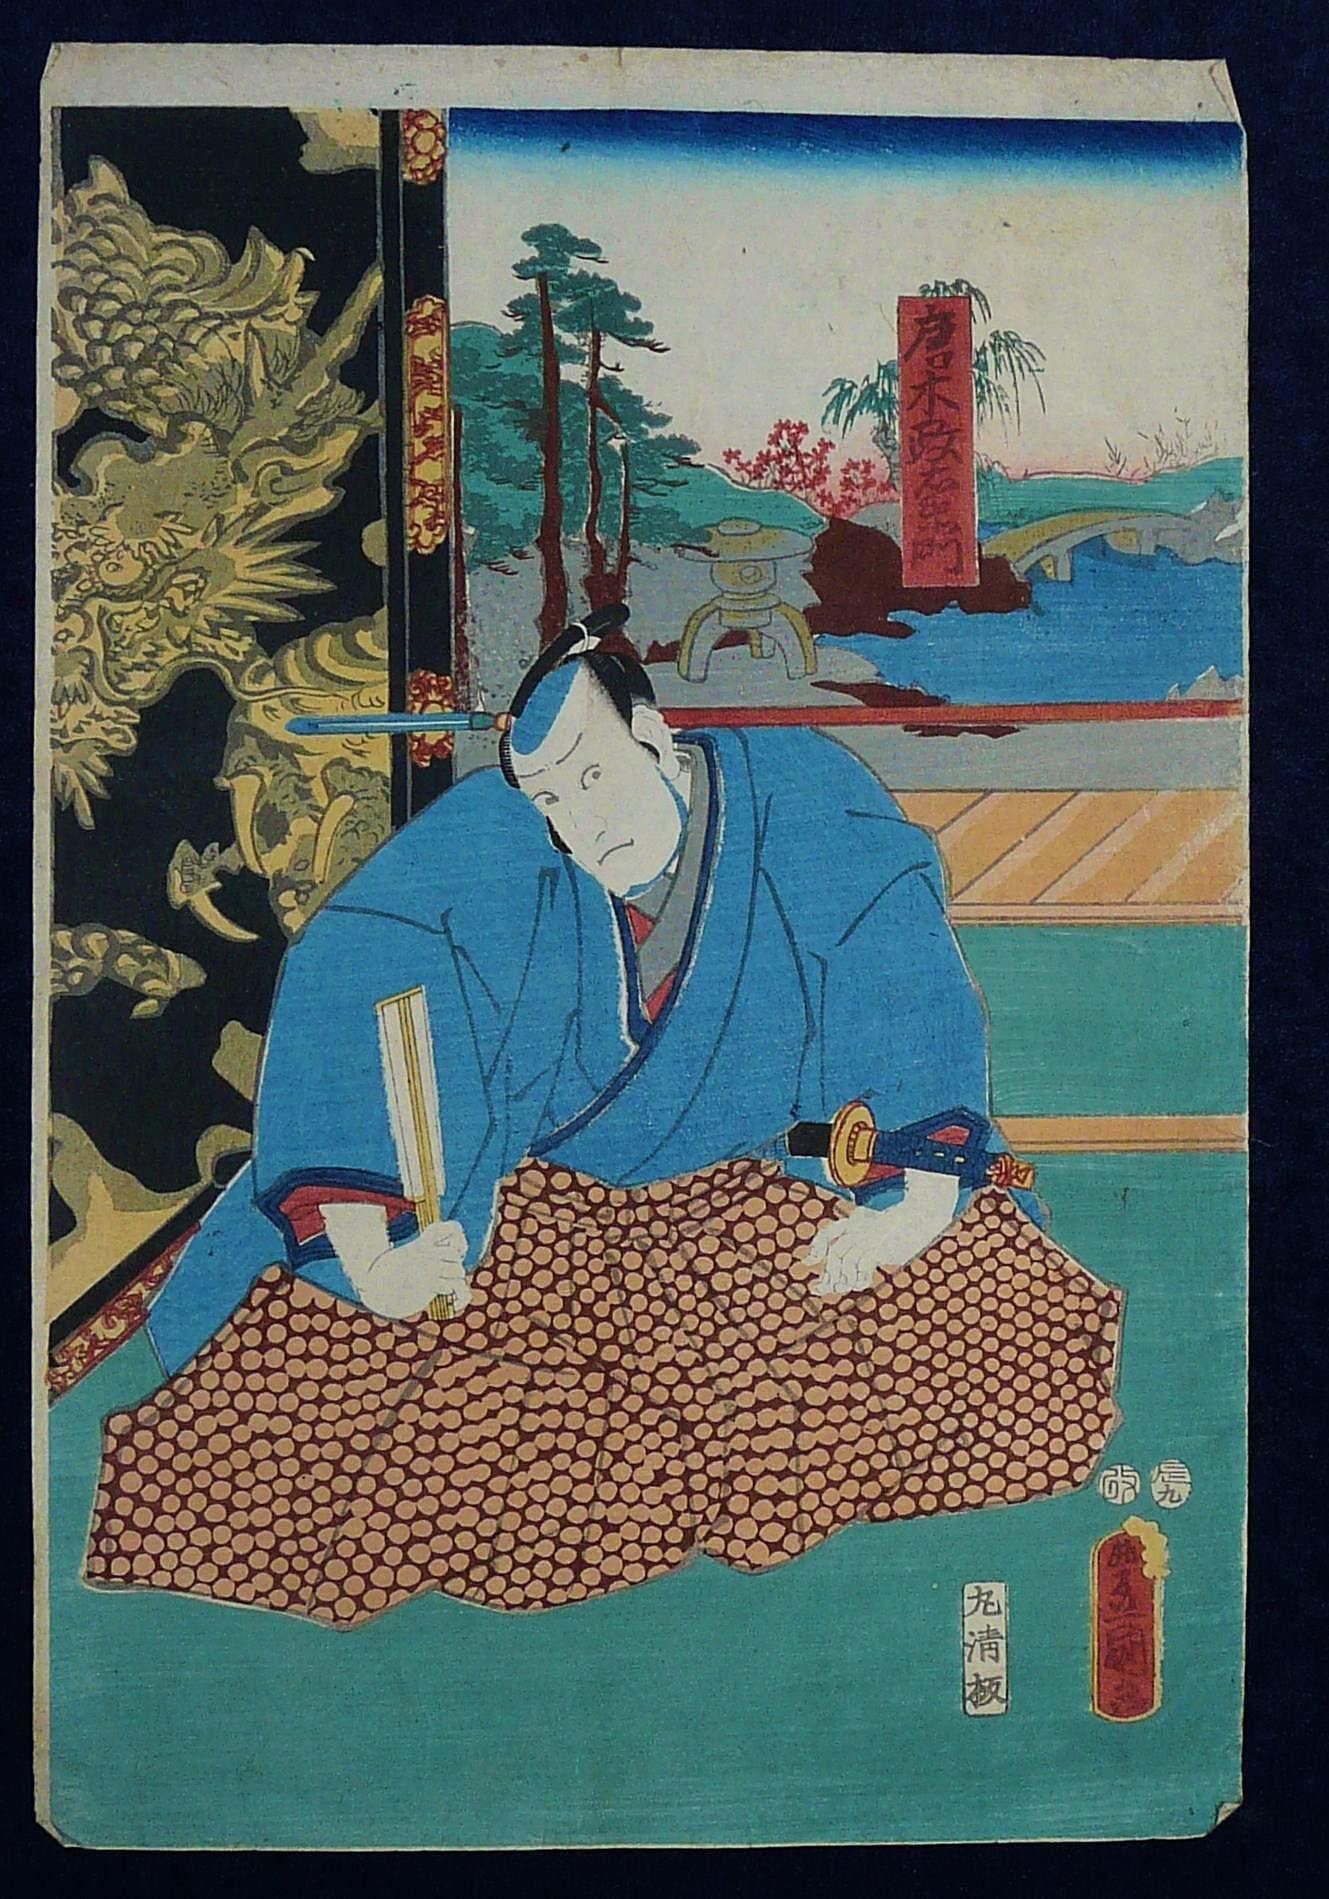 UTAGAWA KUNISADA: #P3862 SAMURAI MEDITATING BY A DRAGON SCREEN 1853 to 1857